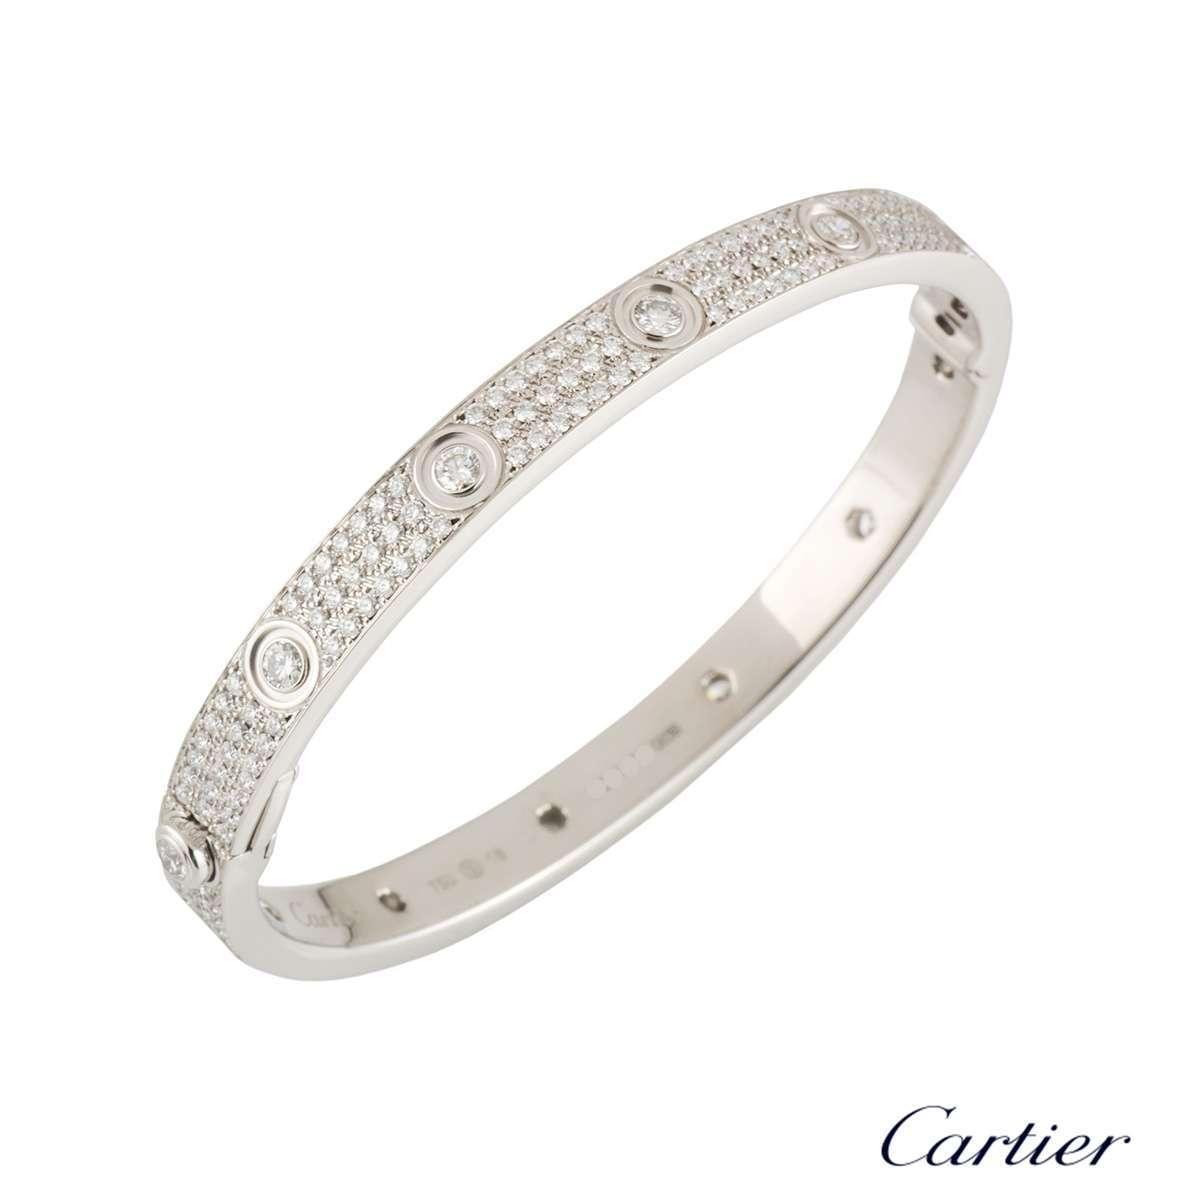 Cartier White Gold Pave Diamond LoveBracelet Size 18N6033602